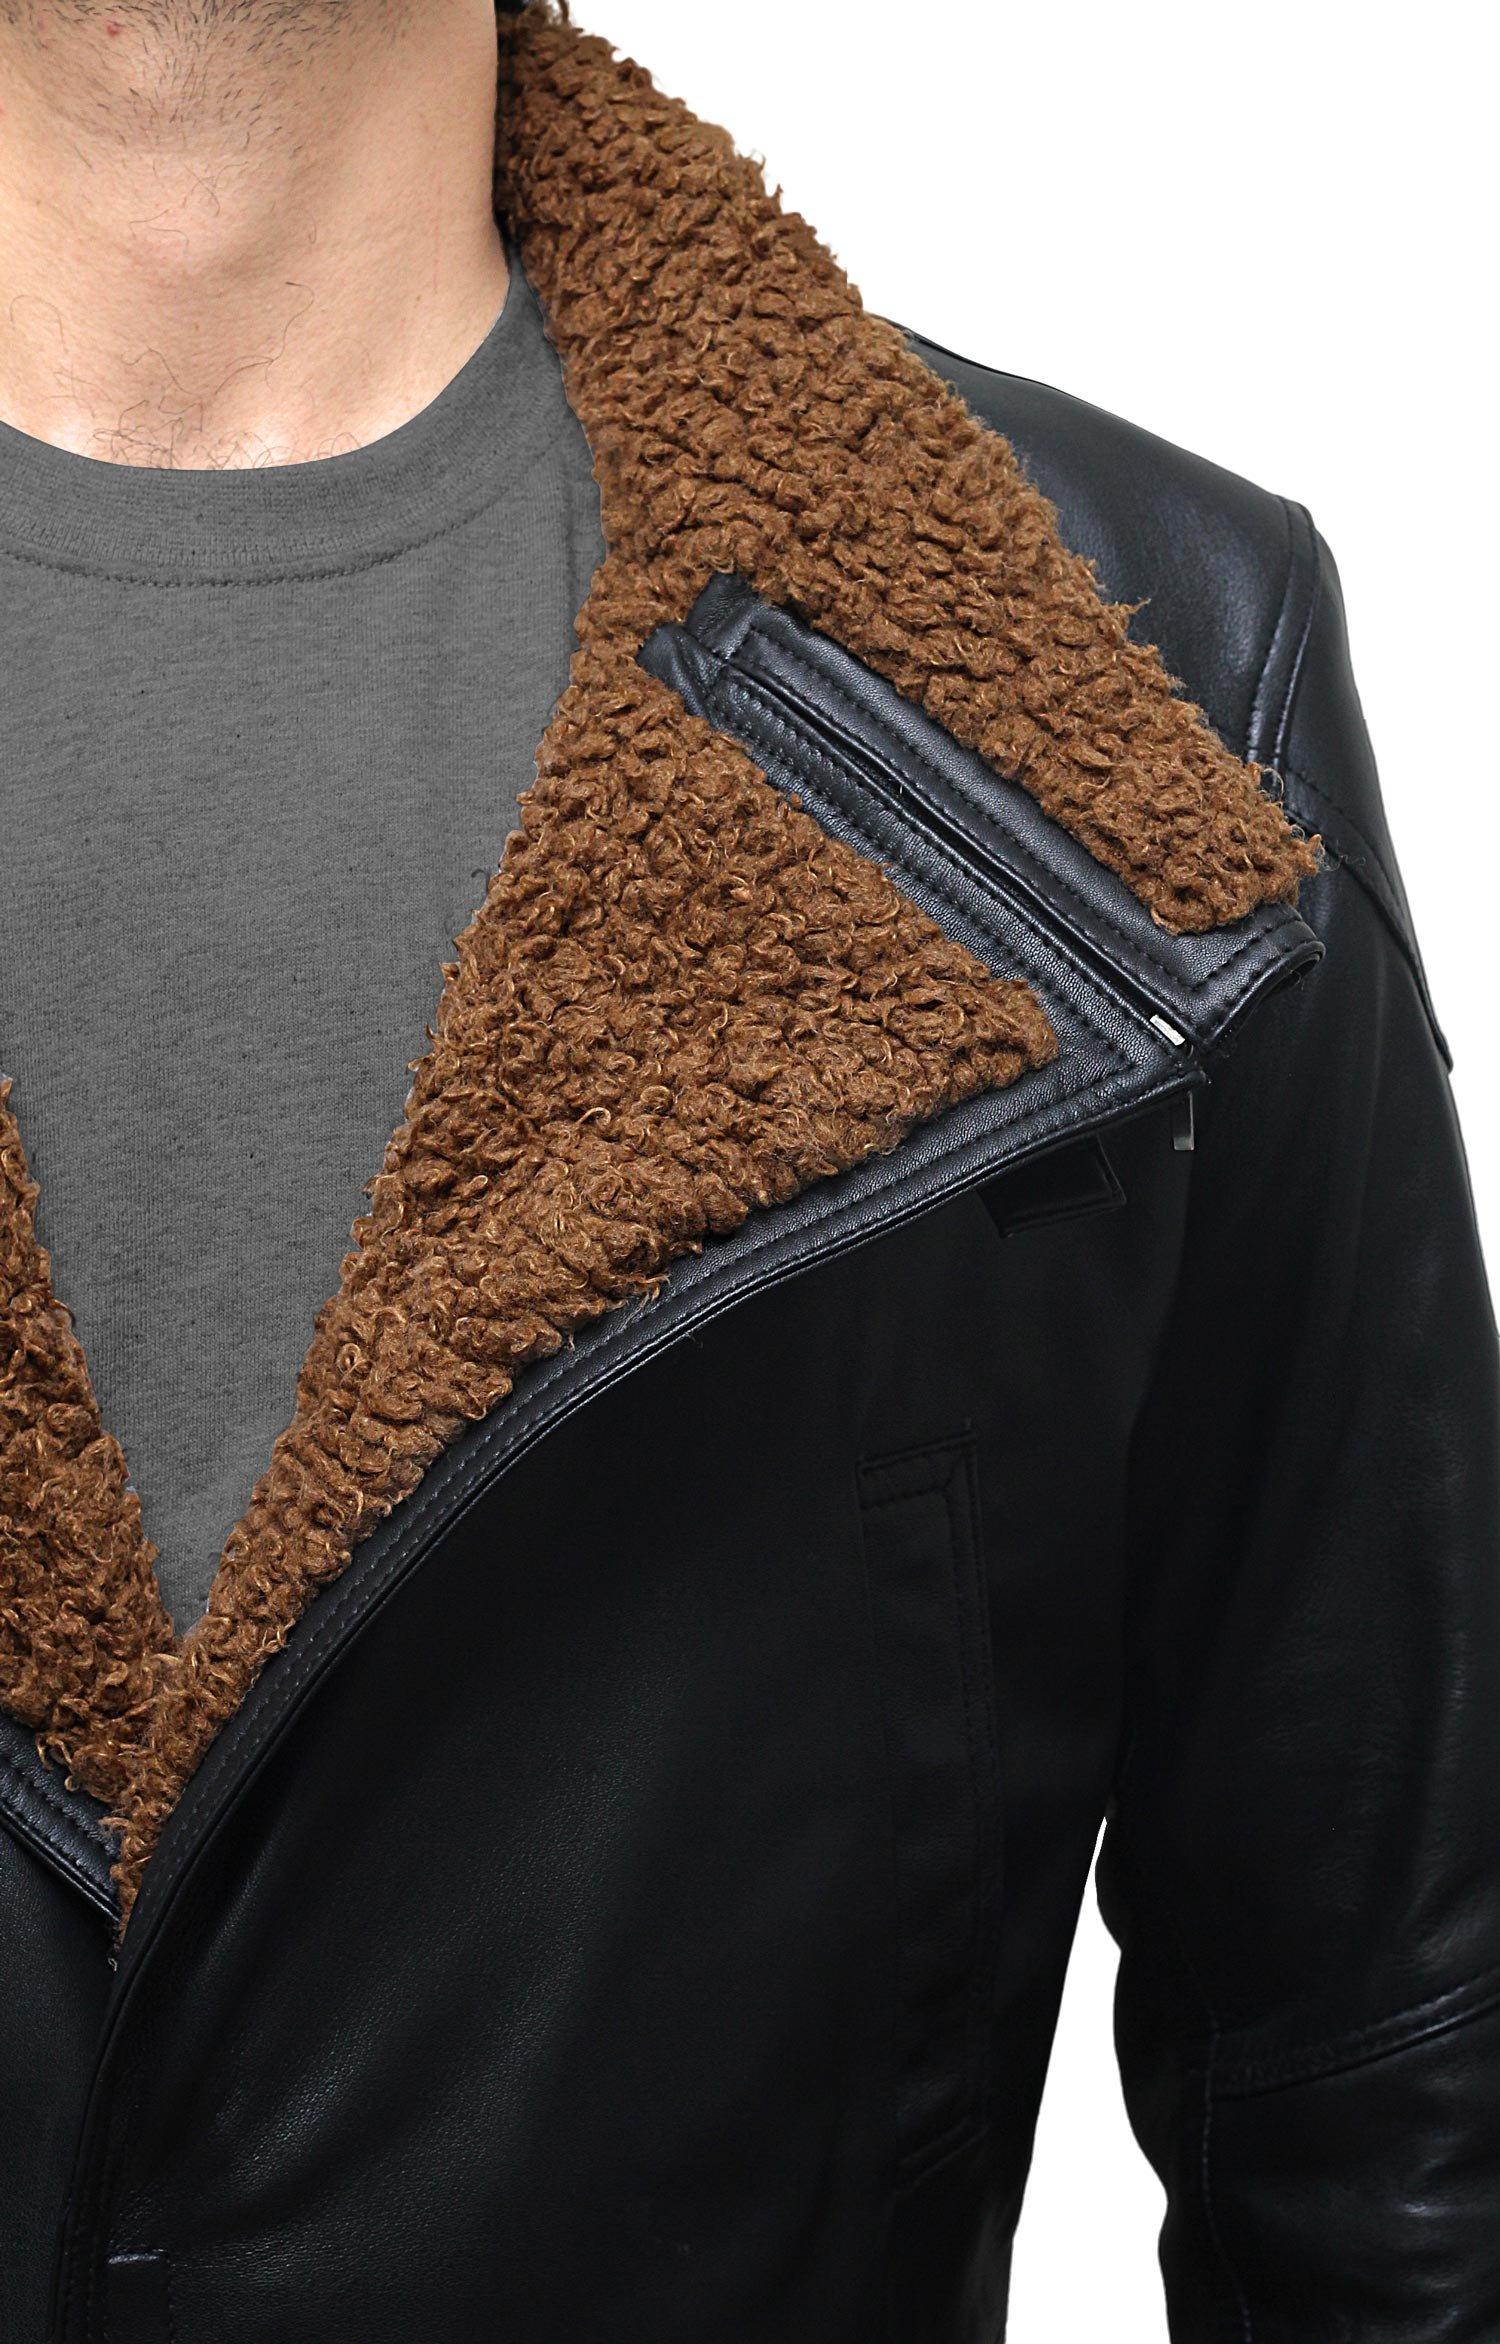 BlingSoul Blade Fur Coat Men Costume - Boys Black Leather Coat (XL) [PU-BLRN-BL-XL] by BlingSoul (Image #5)